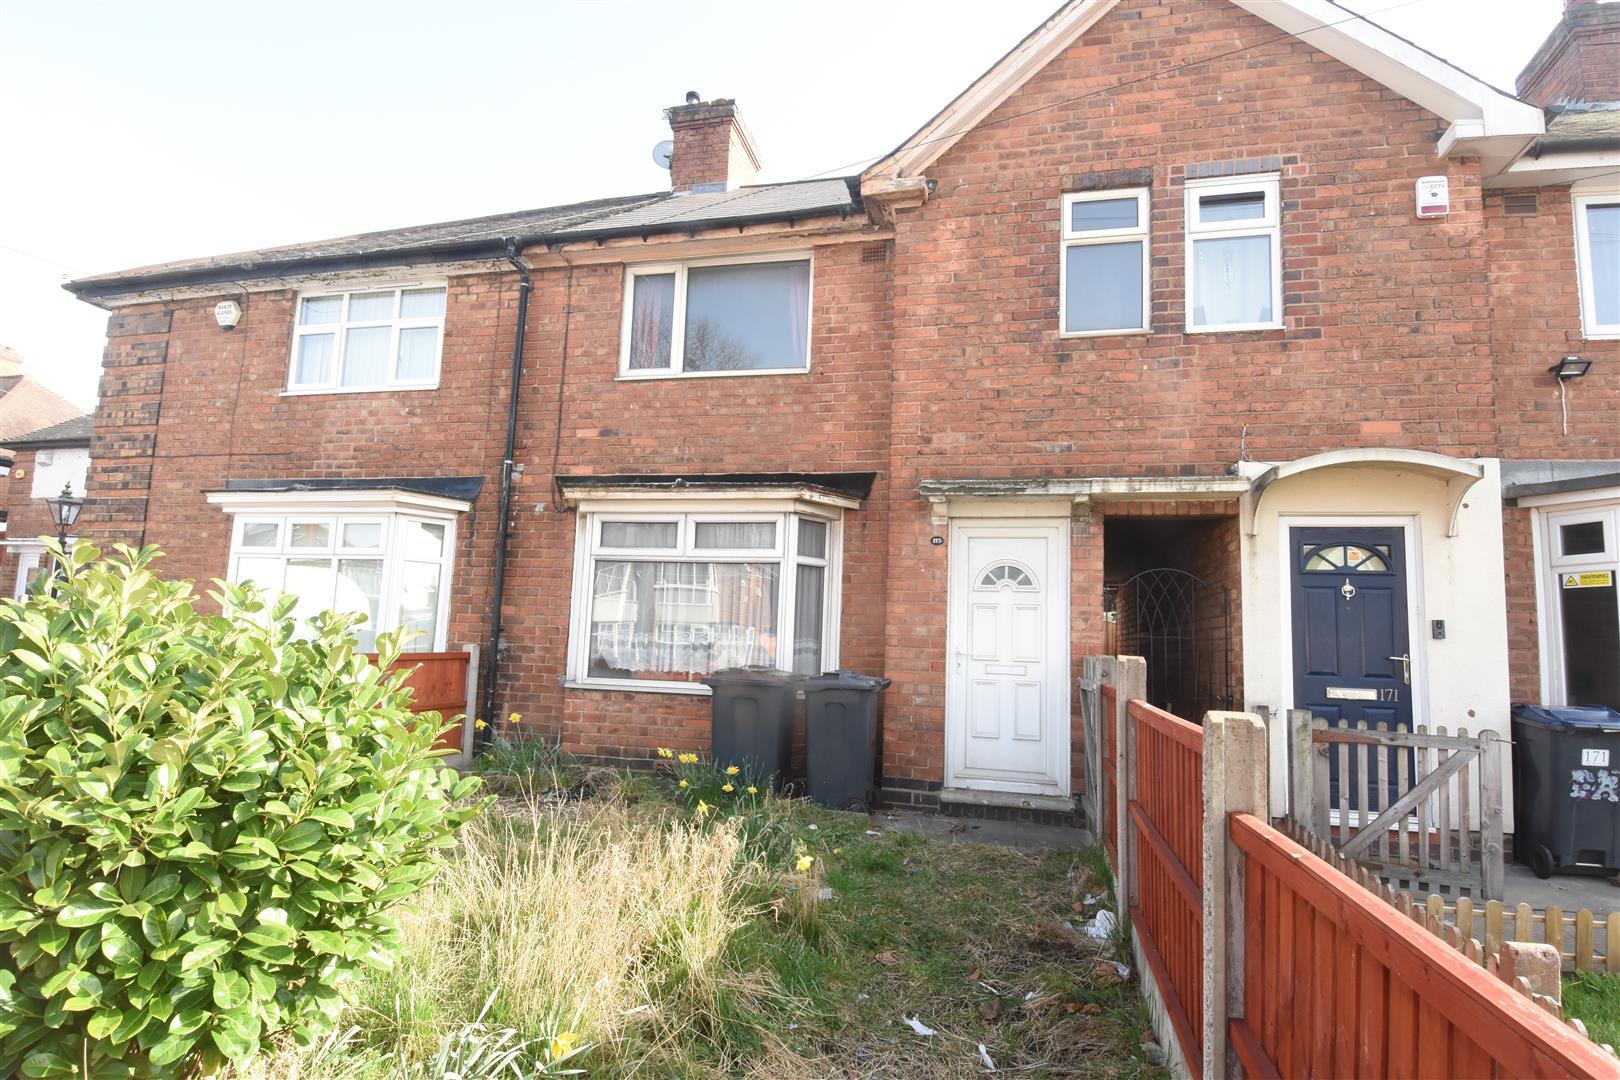 3 bed house for sale in Drews Lane, Ward End, Birmingham, B8